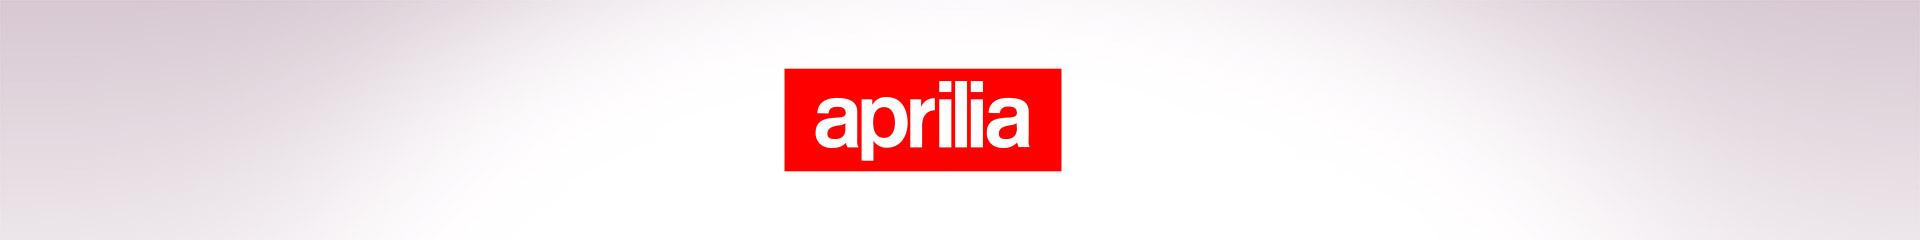 Ricambi Moto Aprilia On Line